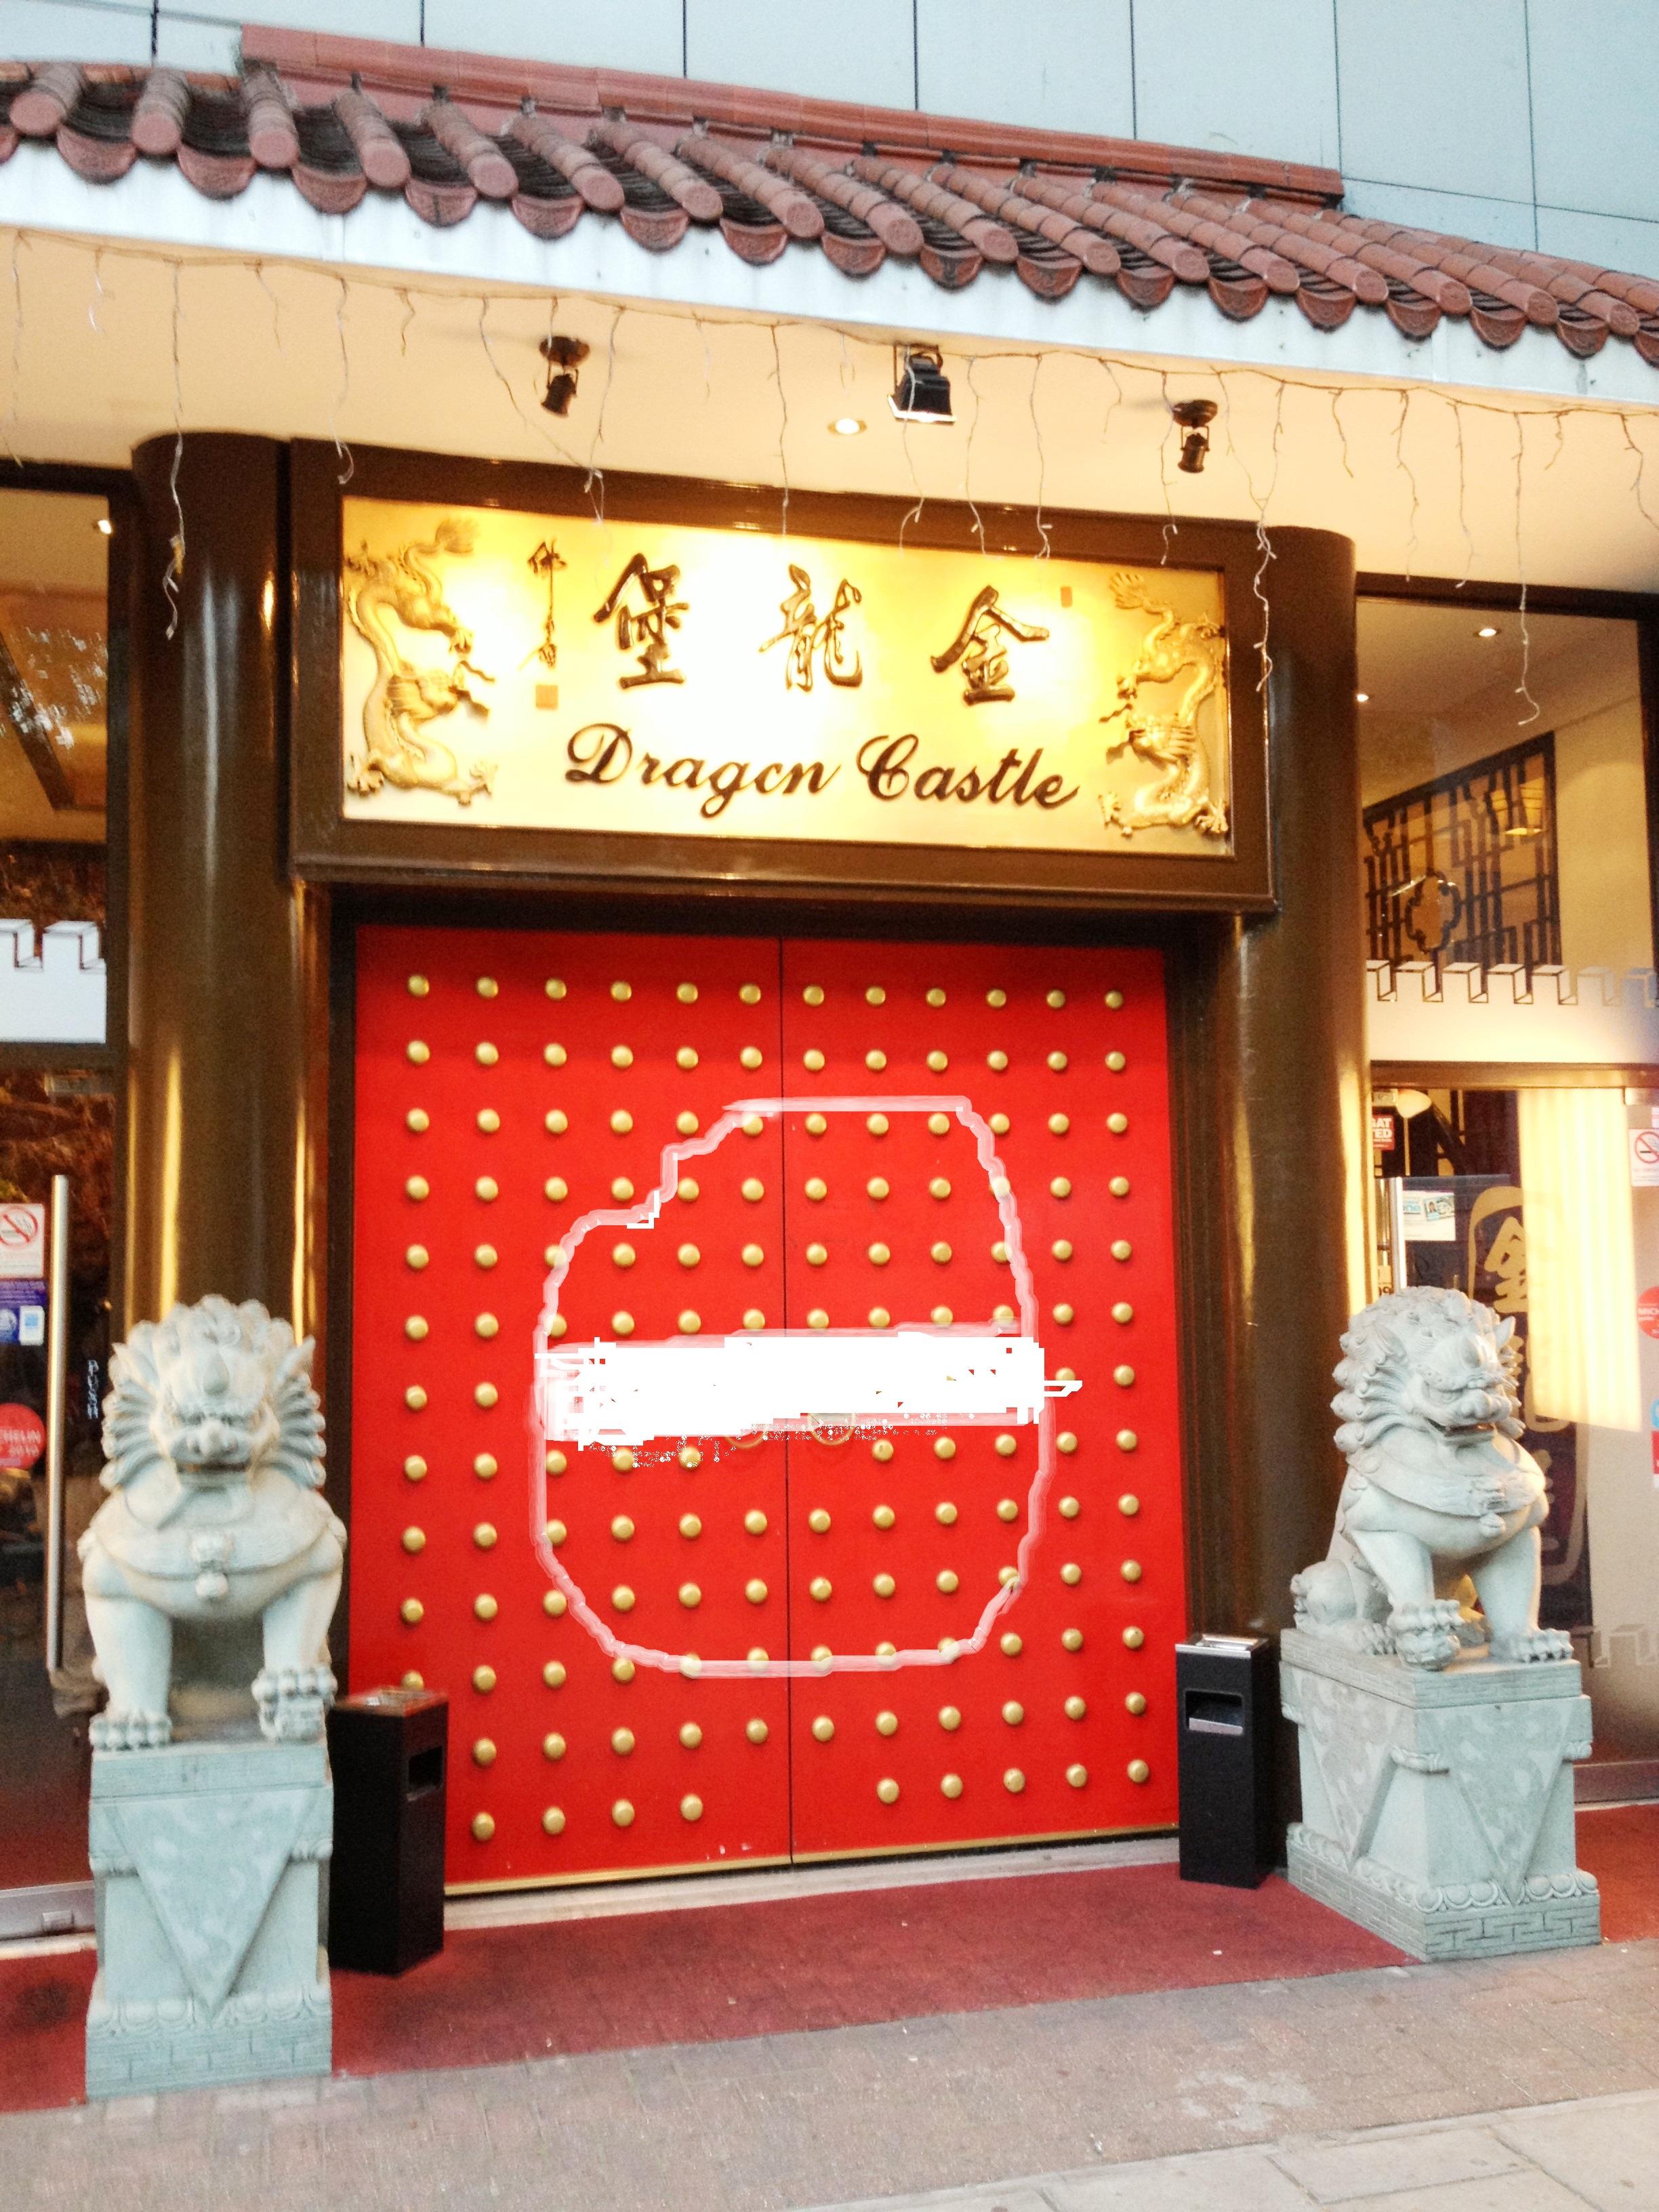 Dragon Castle - kenningtonrunoff.com